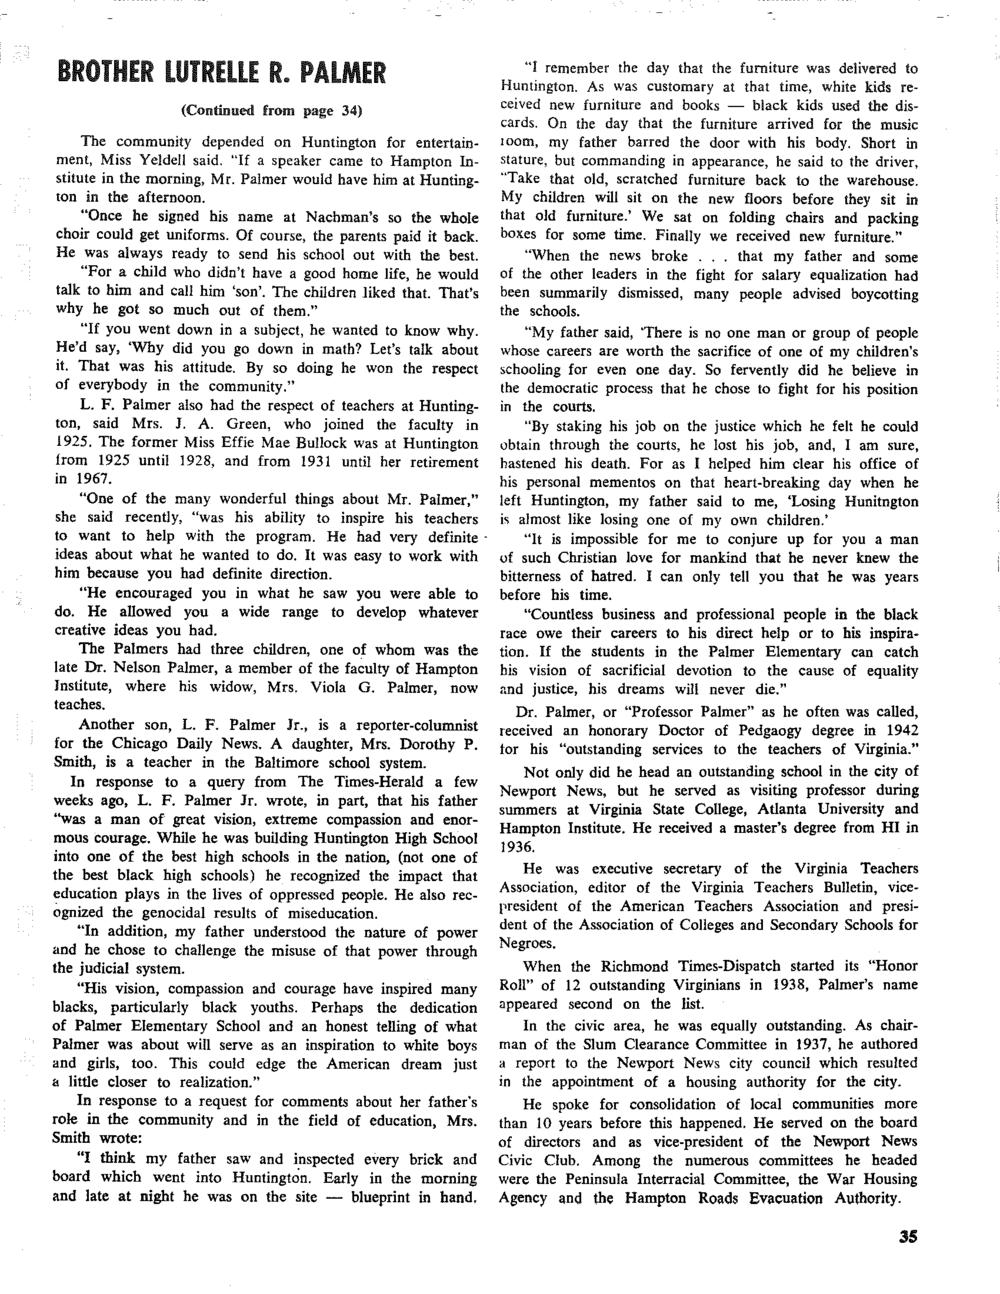 Zeta Lambda 1972 - Palmer Elementary School Dedication 3.png